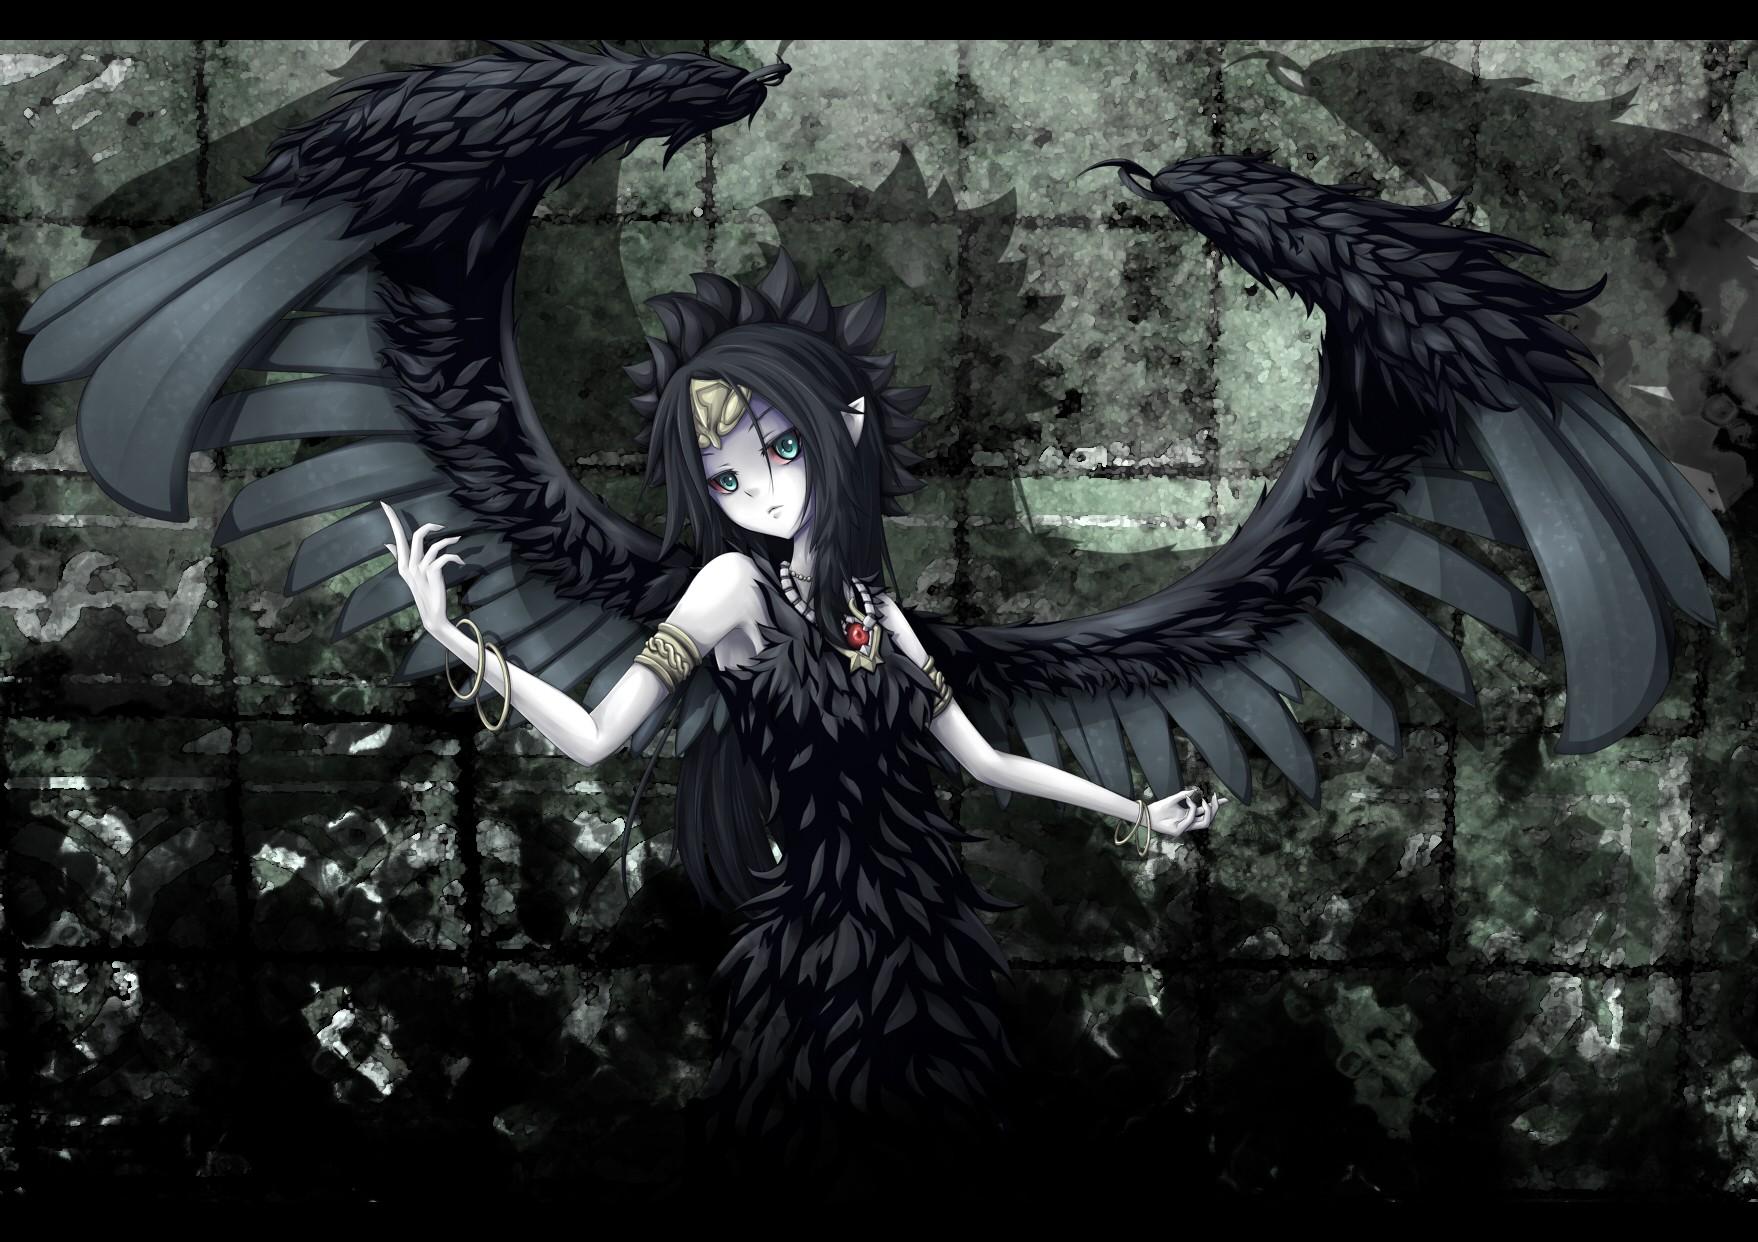 Wallpaper Anime Girls Wings Angel Death Mythology Yu Gi Oh